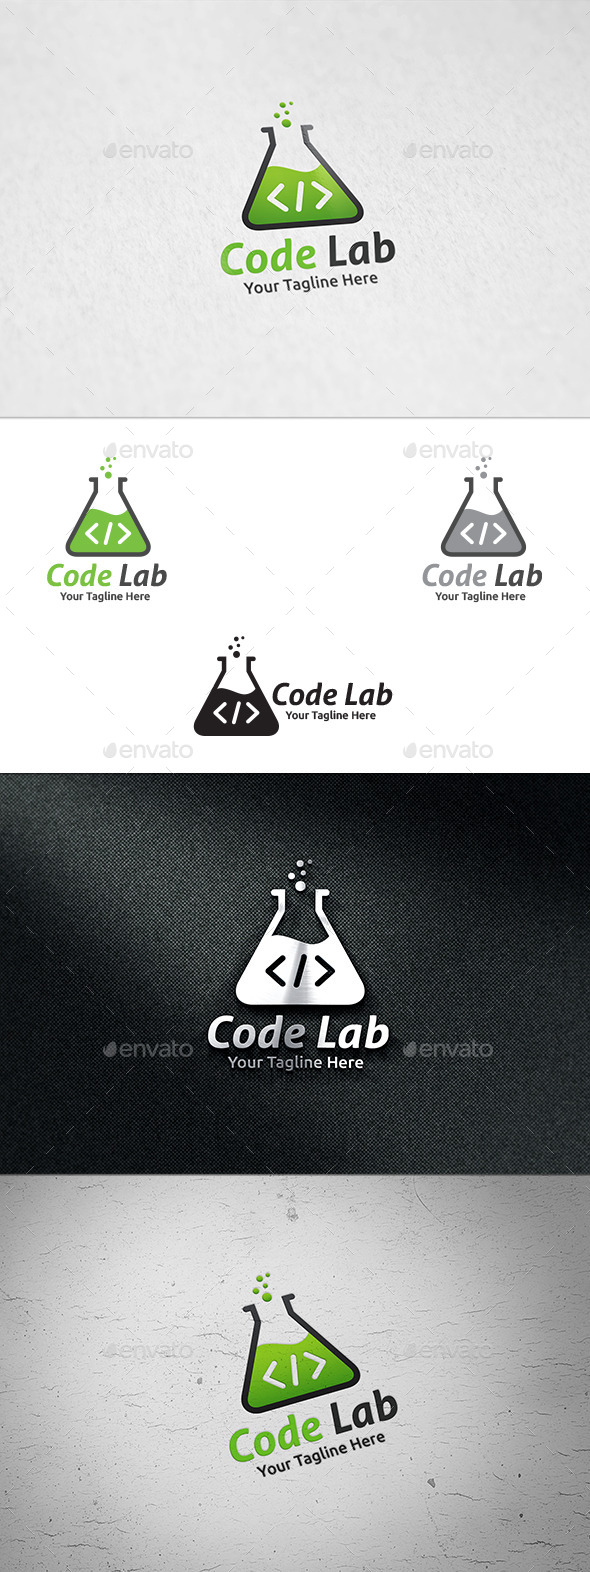 GraphicRiver Code Lab Logo Template 8914950